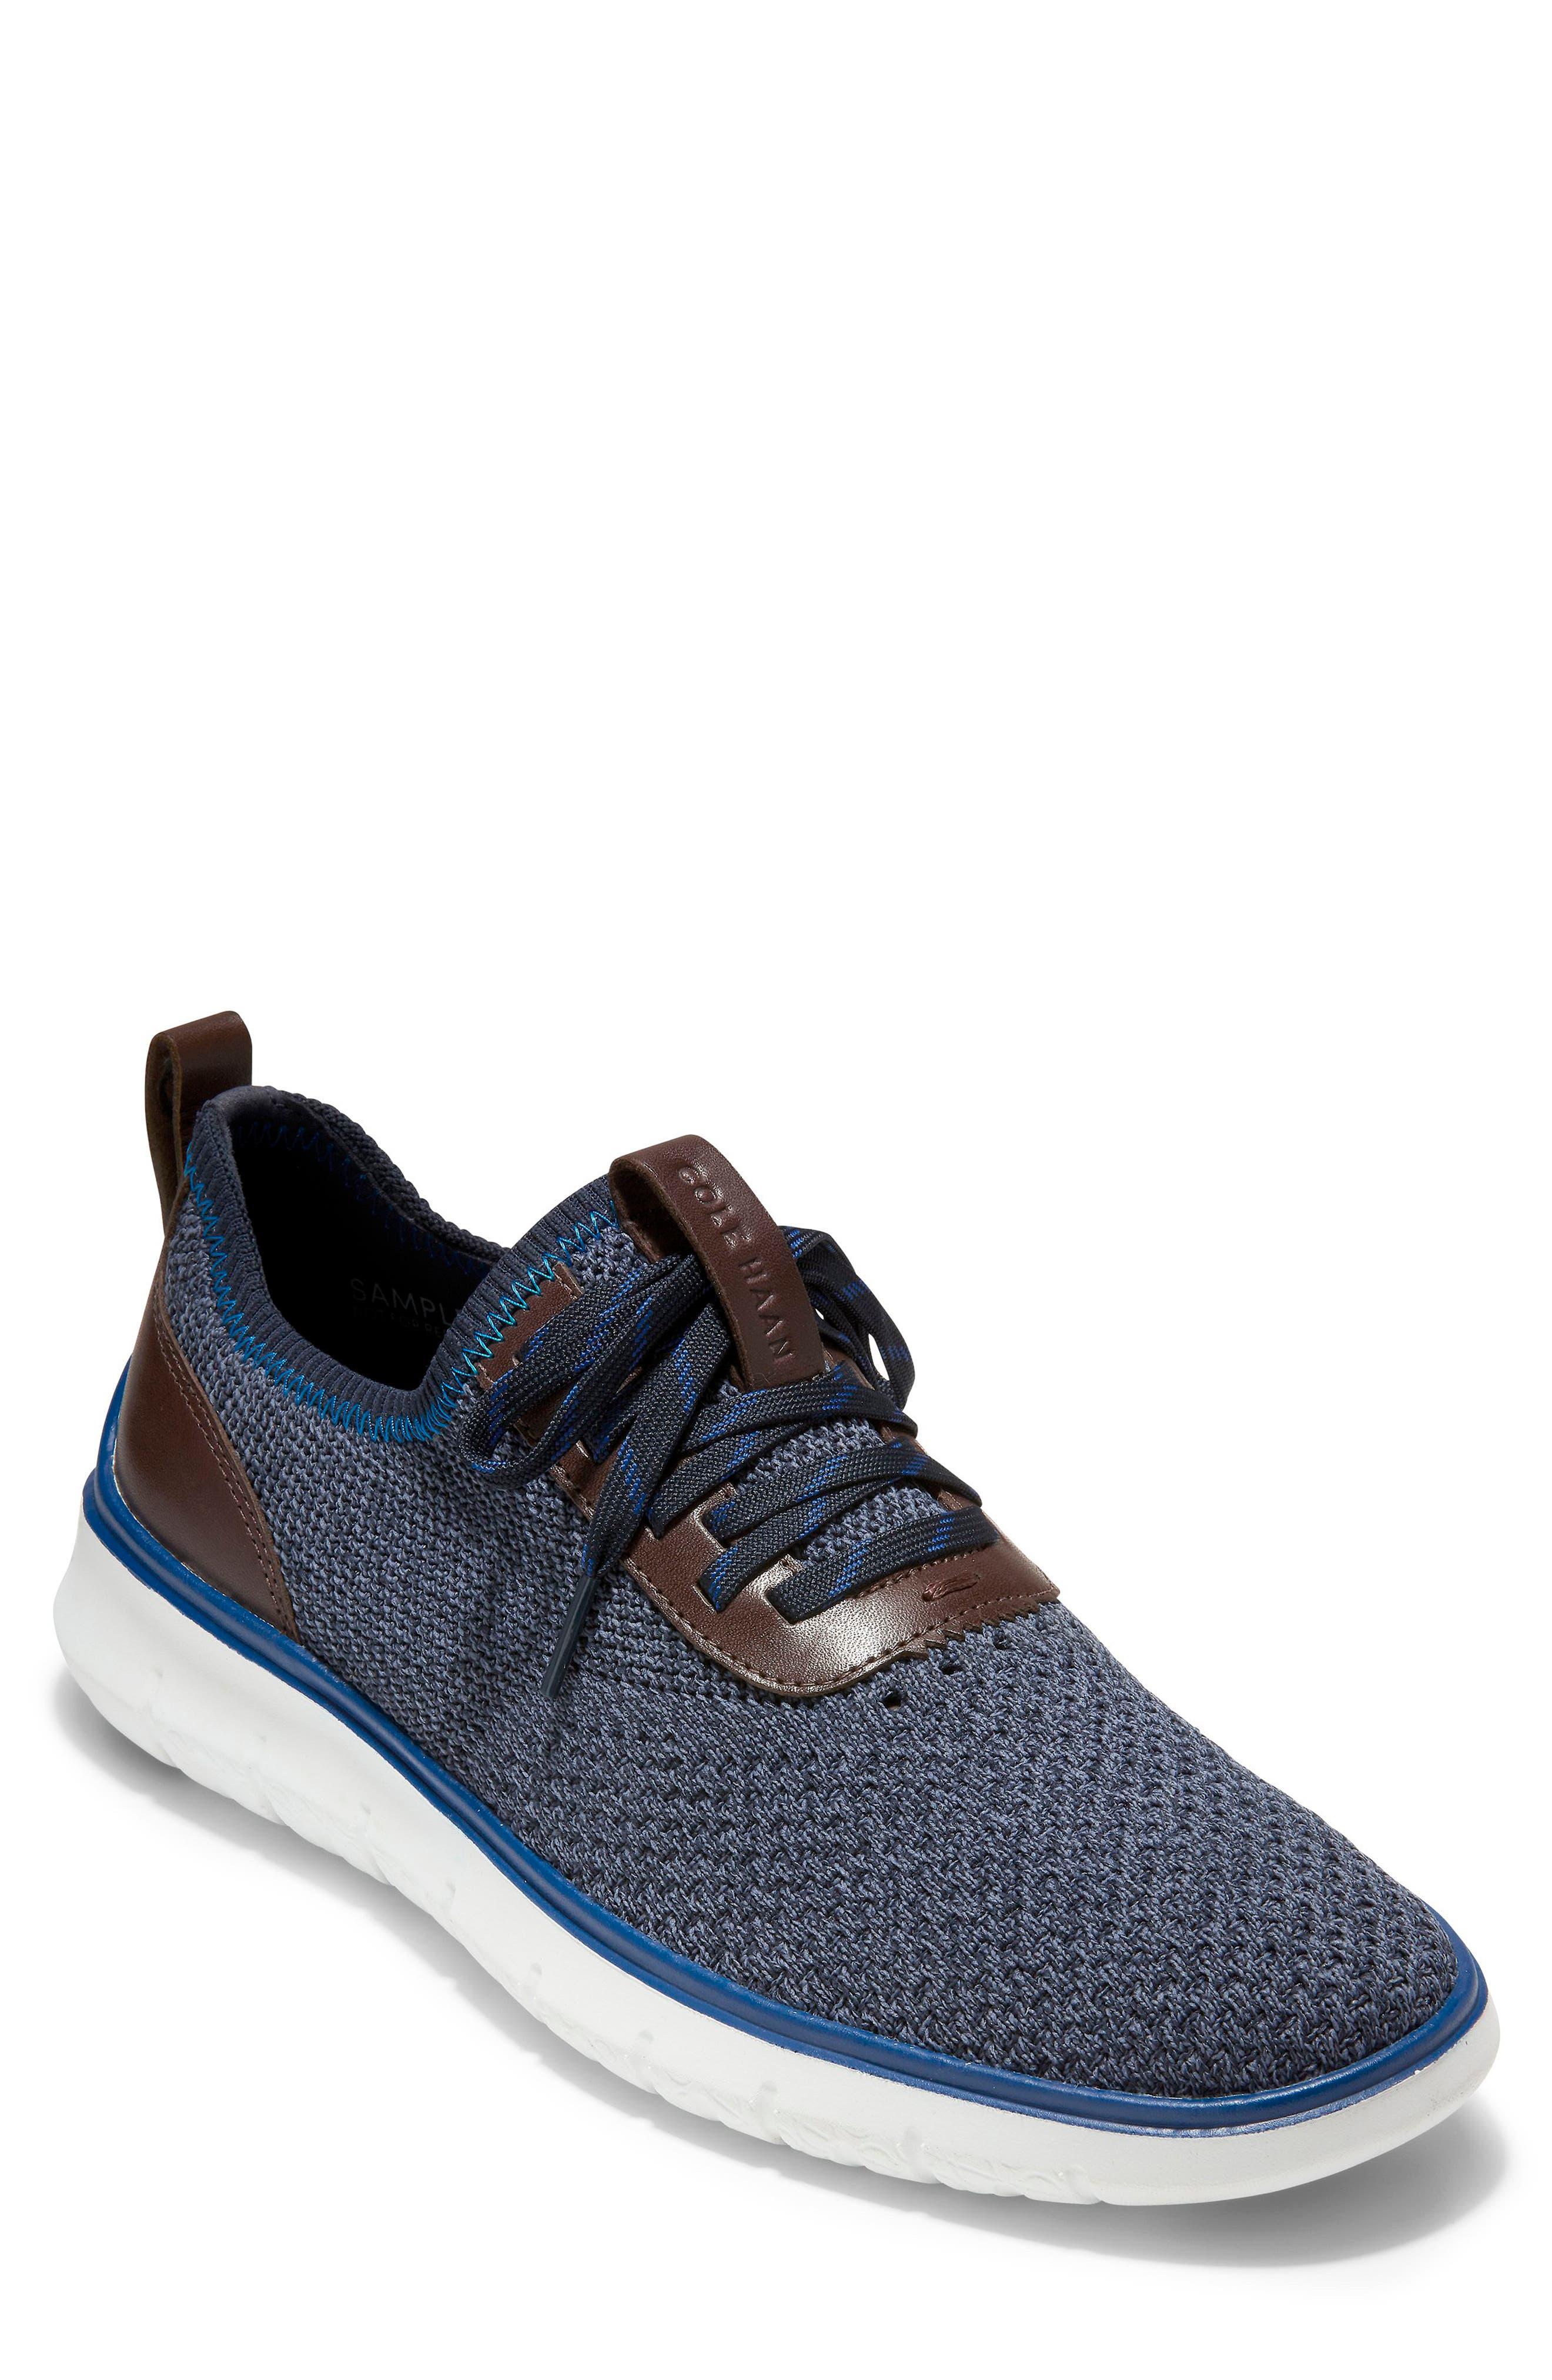 Generation Zerogrand Stitchlite Sneaker